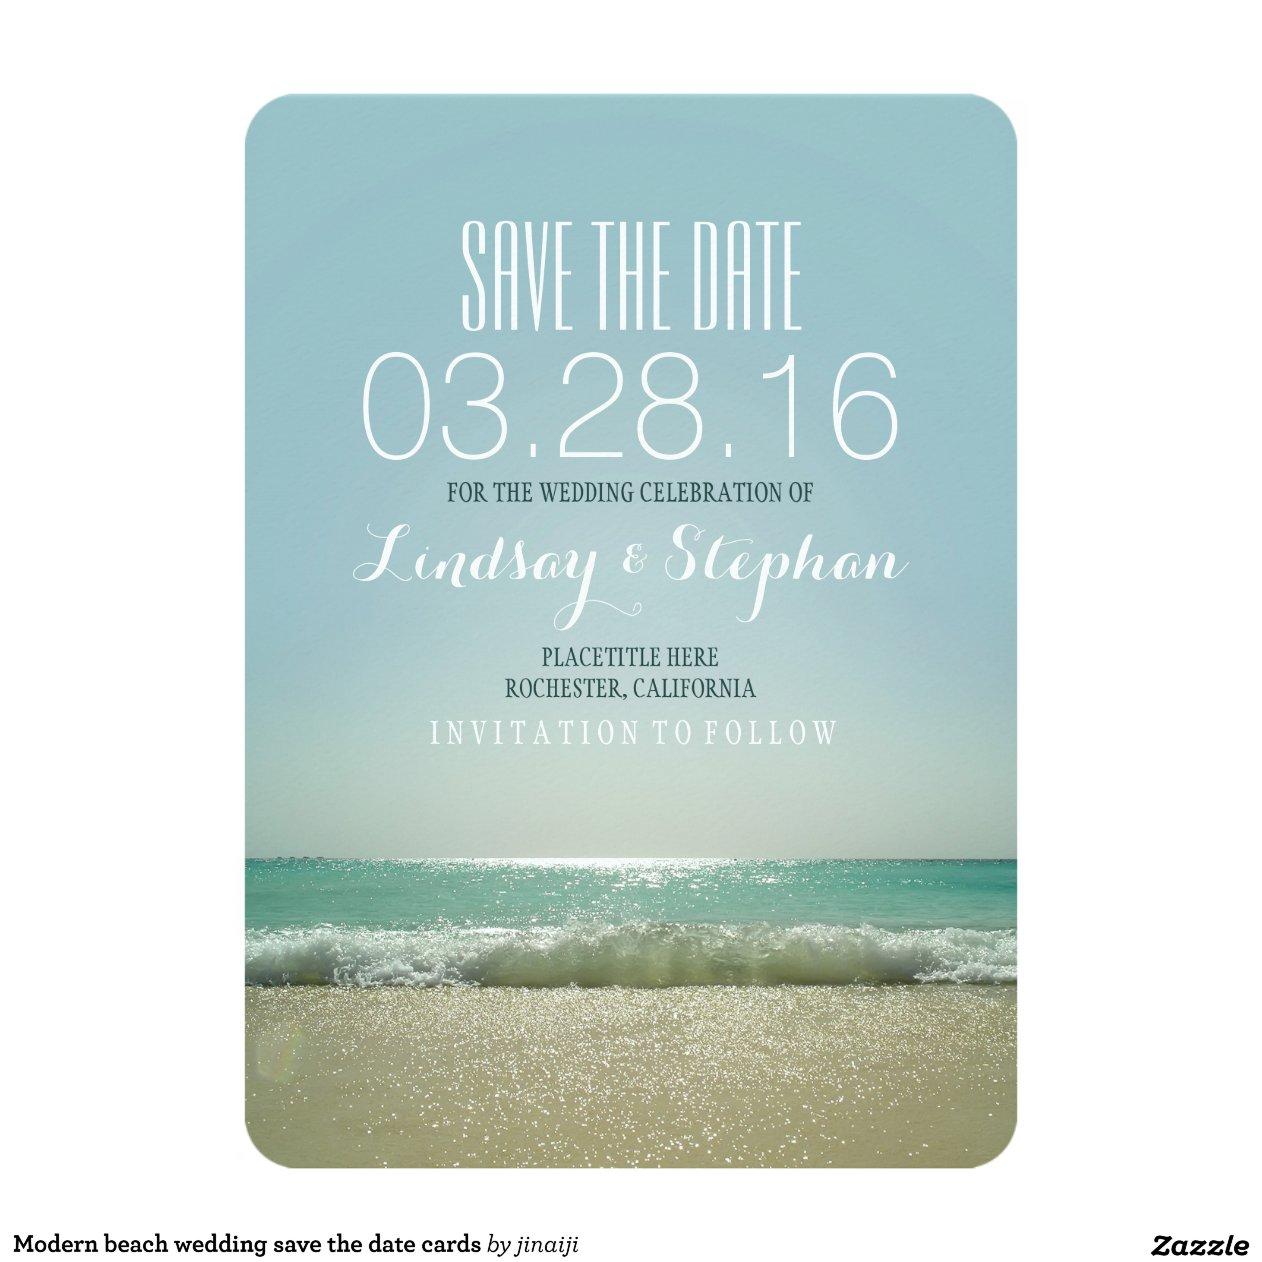 modern beach wedding save the date cards r67605ae18cdd44e0868afd3113ea1df2 zk9r0 1200 jpg rlvnet